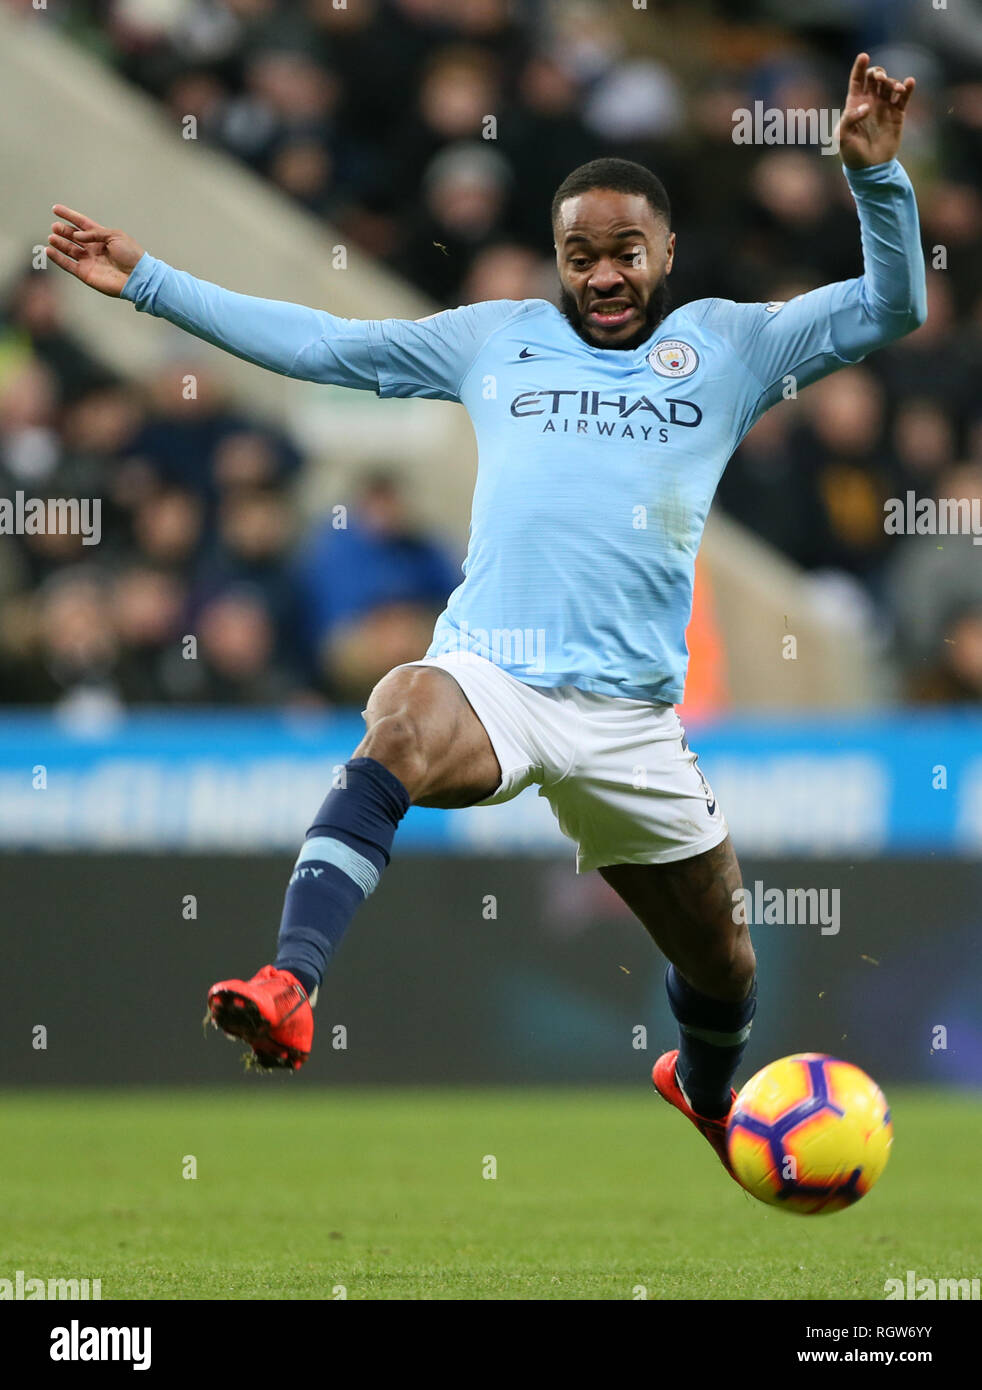 Manchester Citys Raheem Sterling Durante El Partido De Liga